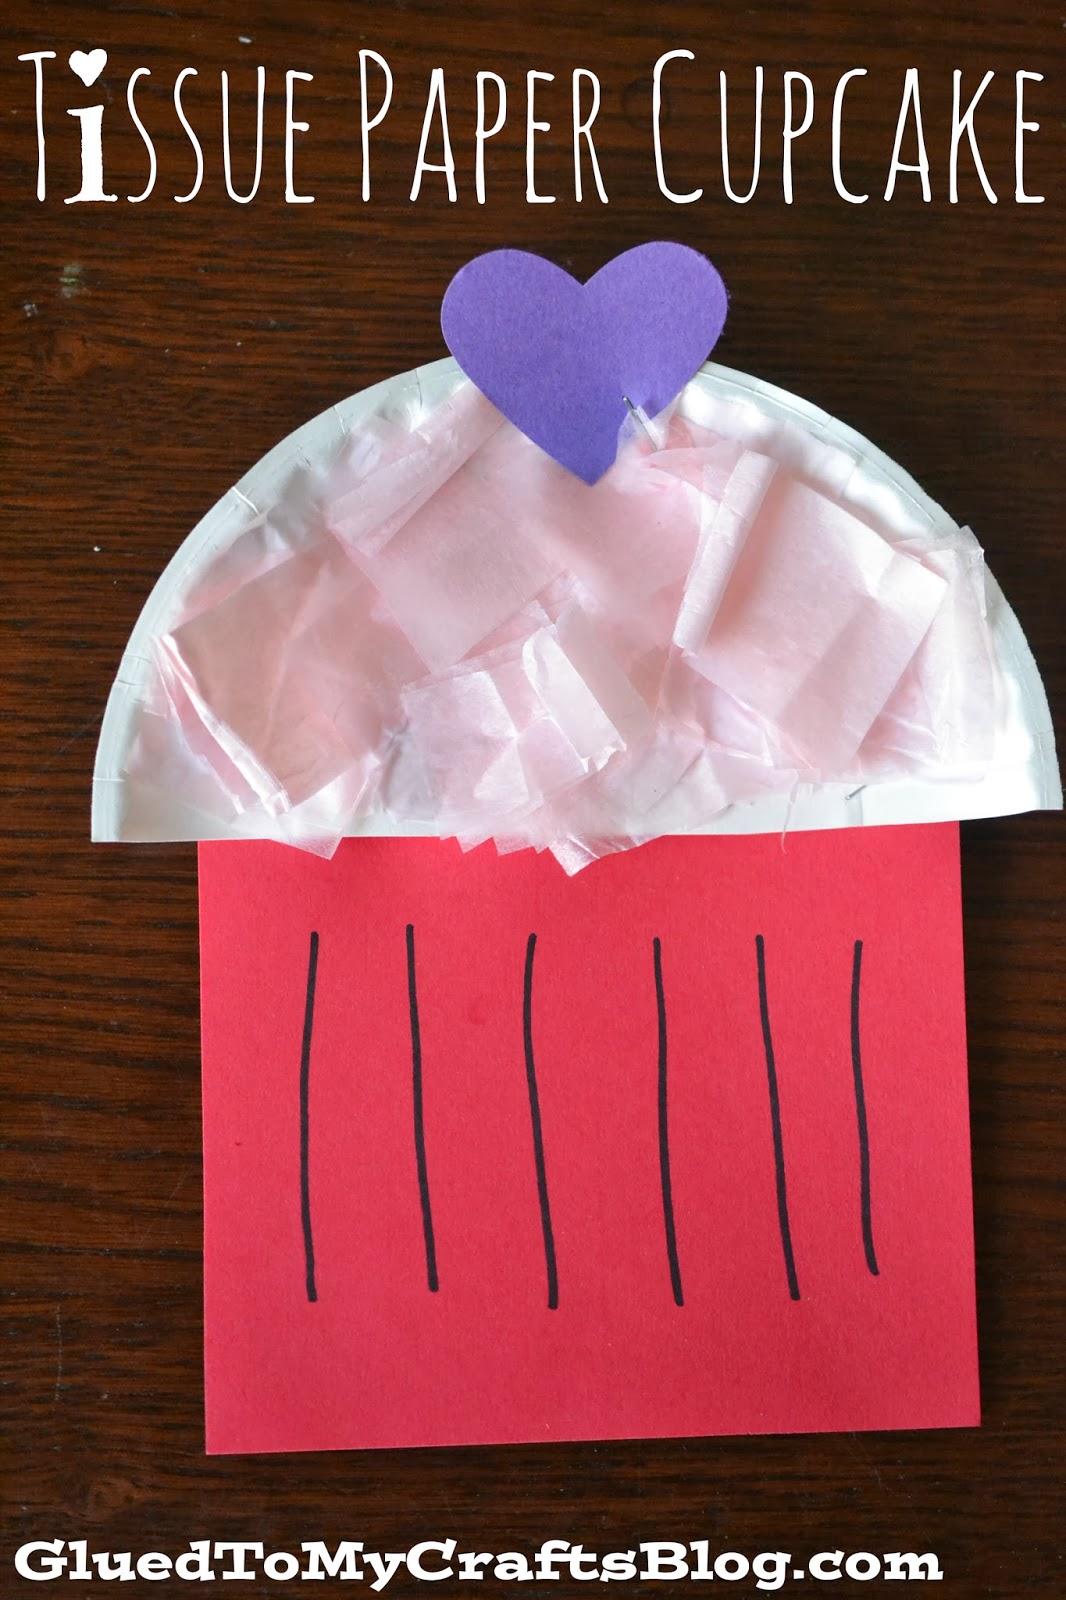 Paper cupcake kid craft tissue paper cupcake kid craft jeuxipadfo Gallery